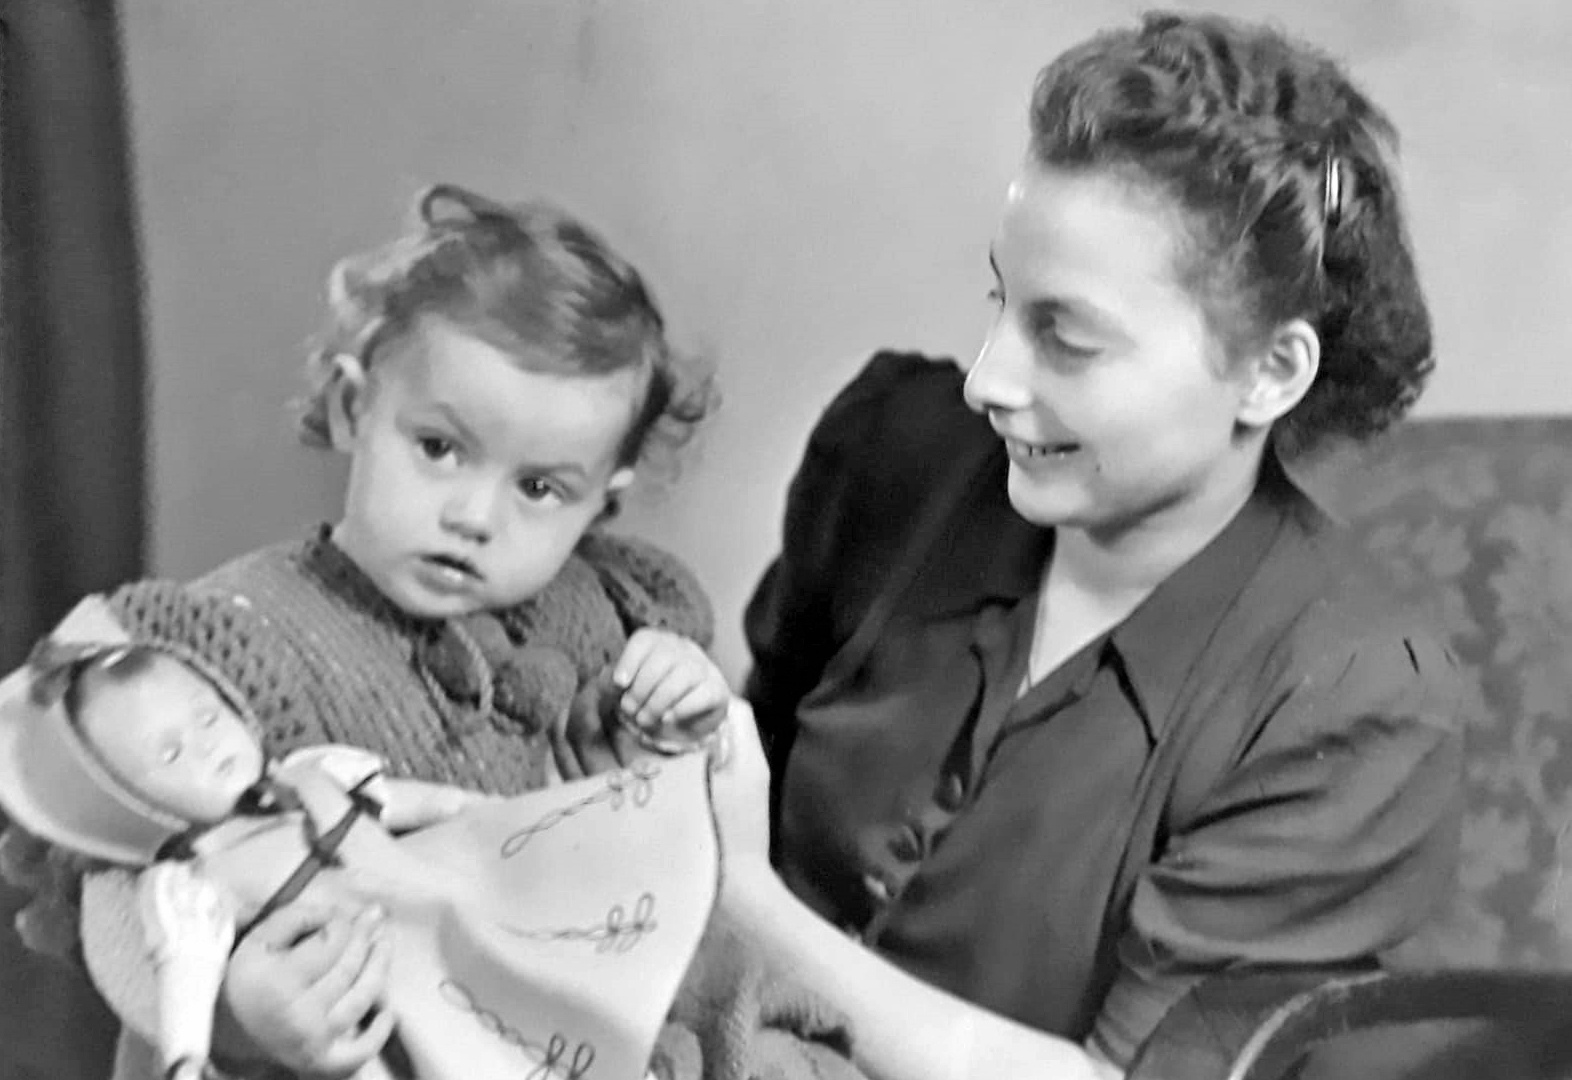 Annelise et Heidelore Eimer en 1951 ou 1952.